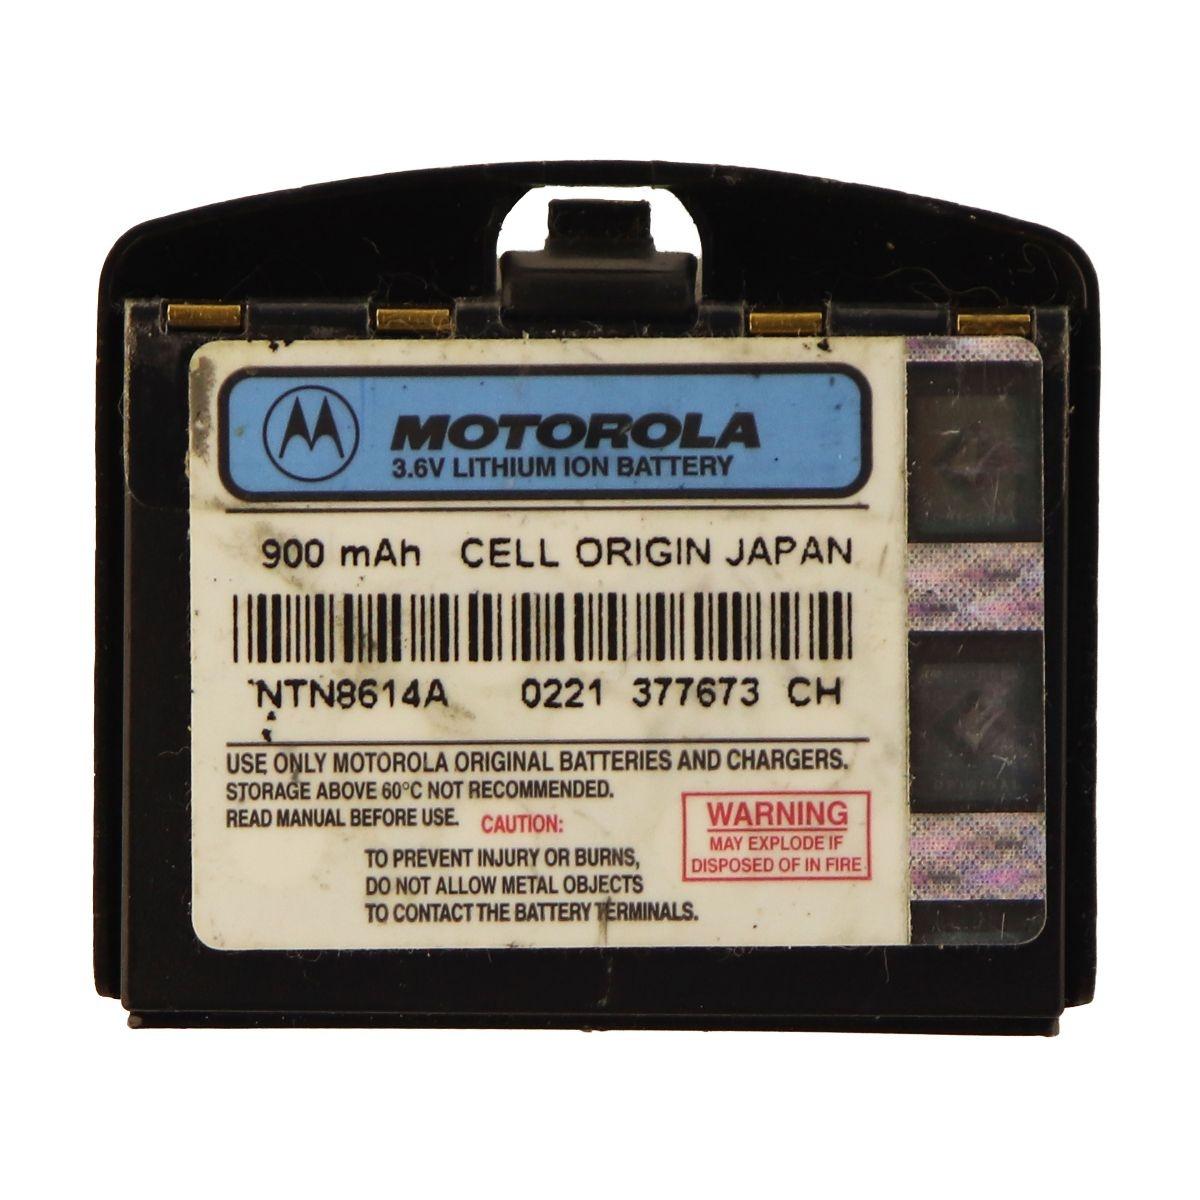 OEM Motorola NTN8614A 900 mAh Replacement Battery for Nextel I1000/I2000